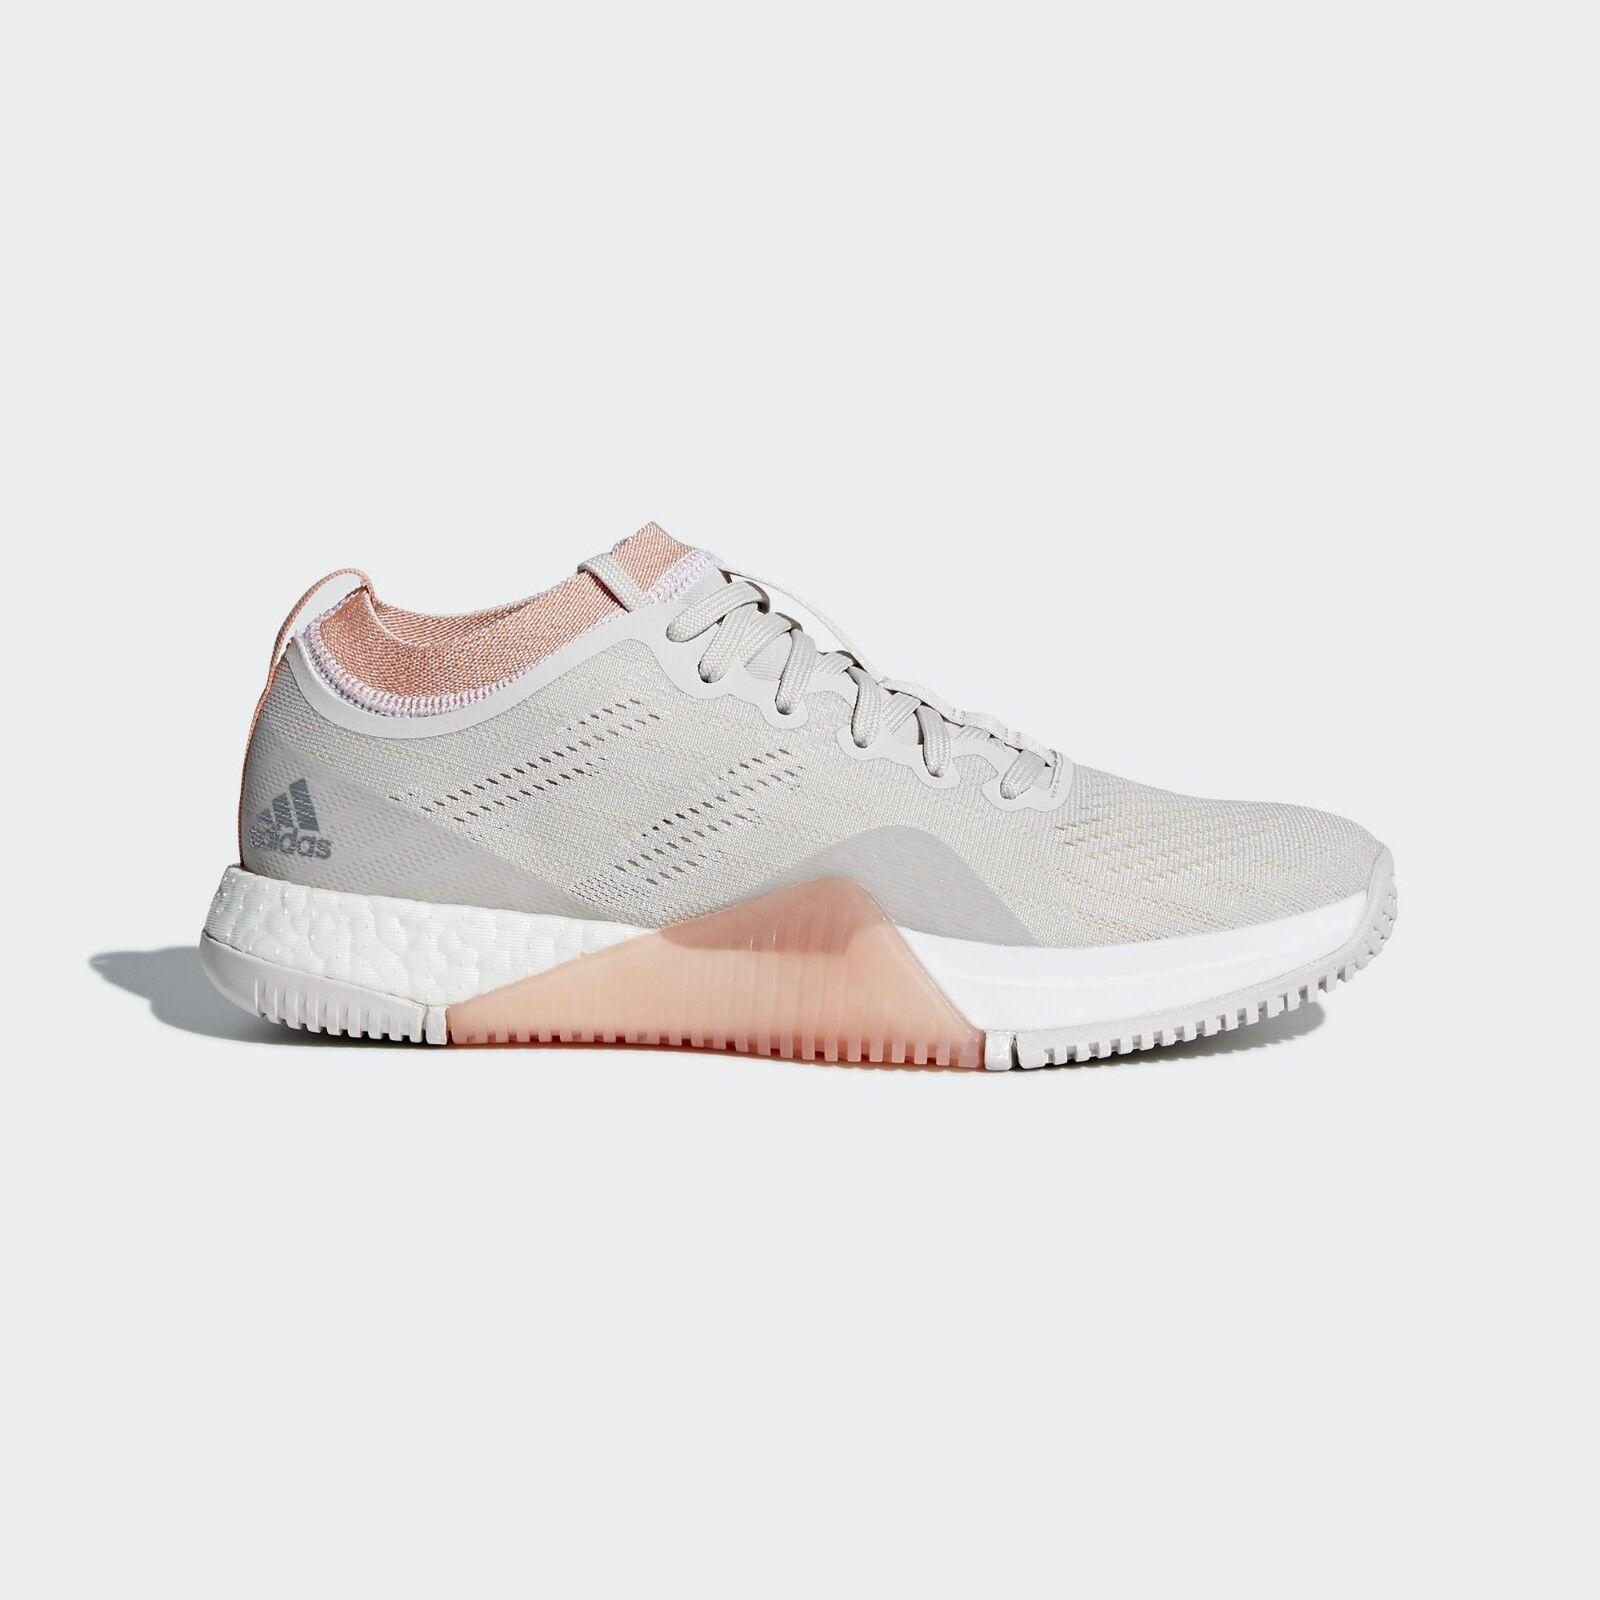 NBAdidas CRAZYTRAIN ELITE BOOST Runing Pure Ultra energy shoes gymWomen sz 10.5